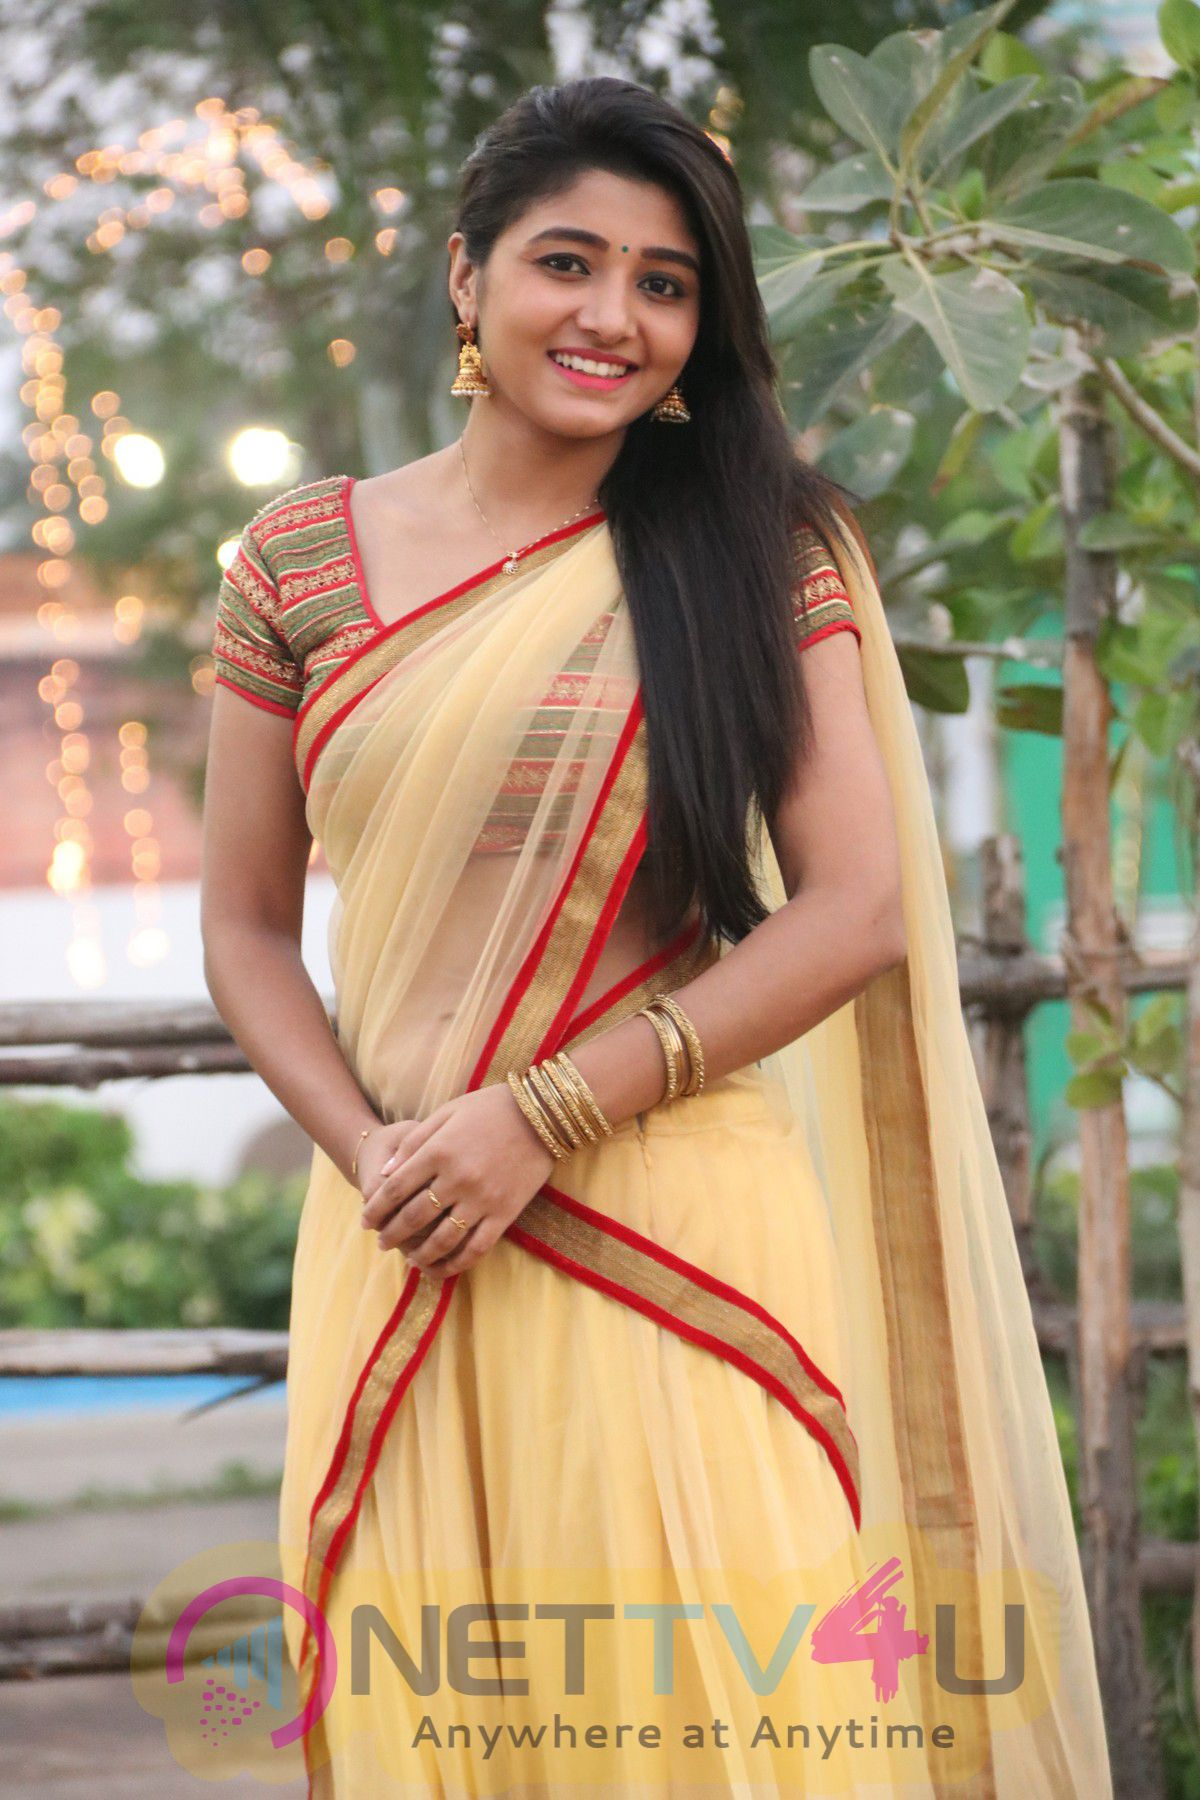 Charming Photos Of Actress Adhiti Menon Inagaurates 43rd India Tourism And Trade Fair Animal Kingdom In Chennai